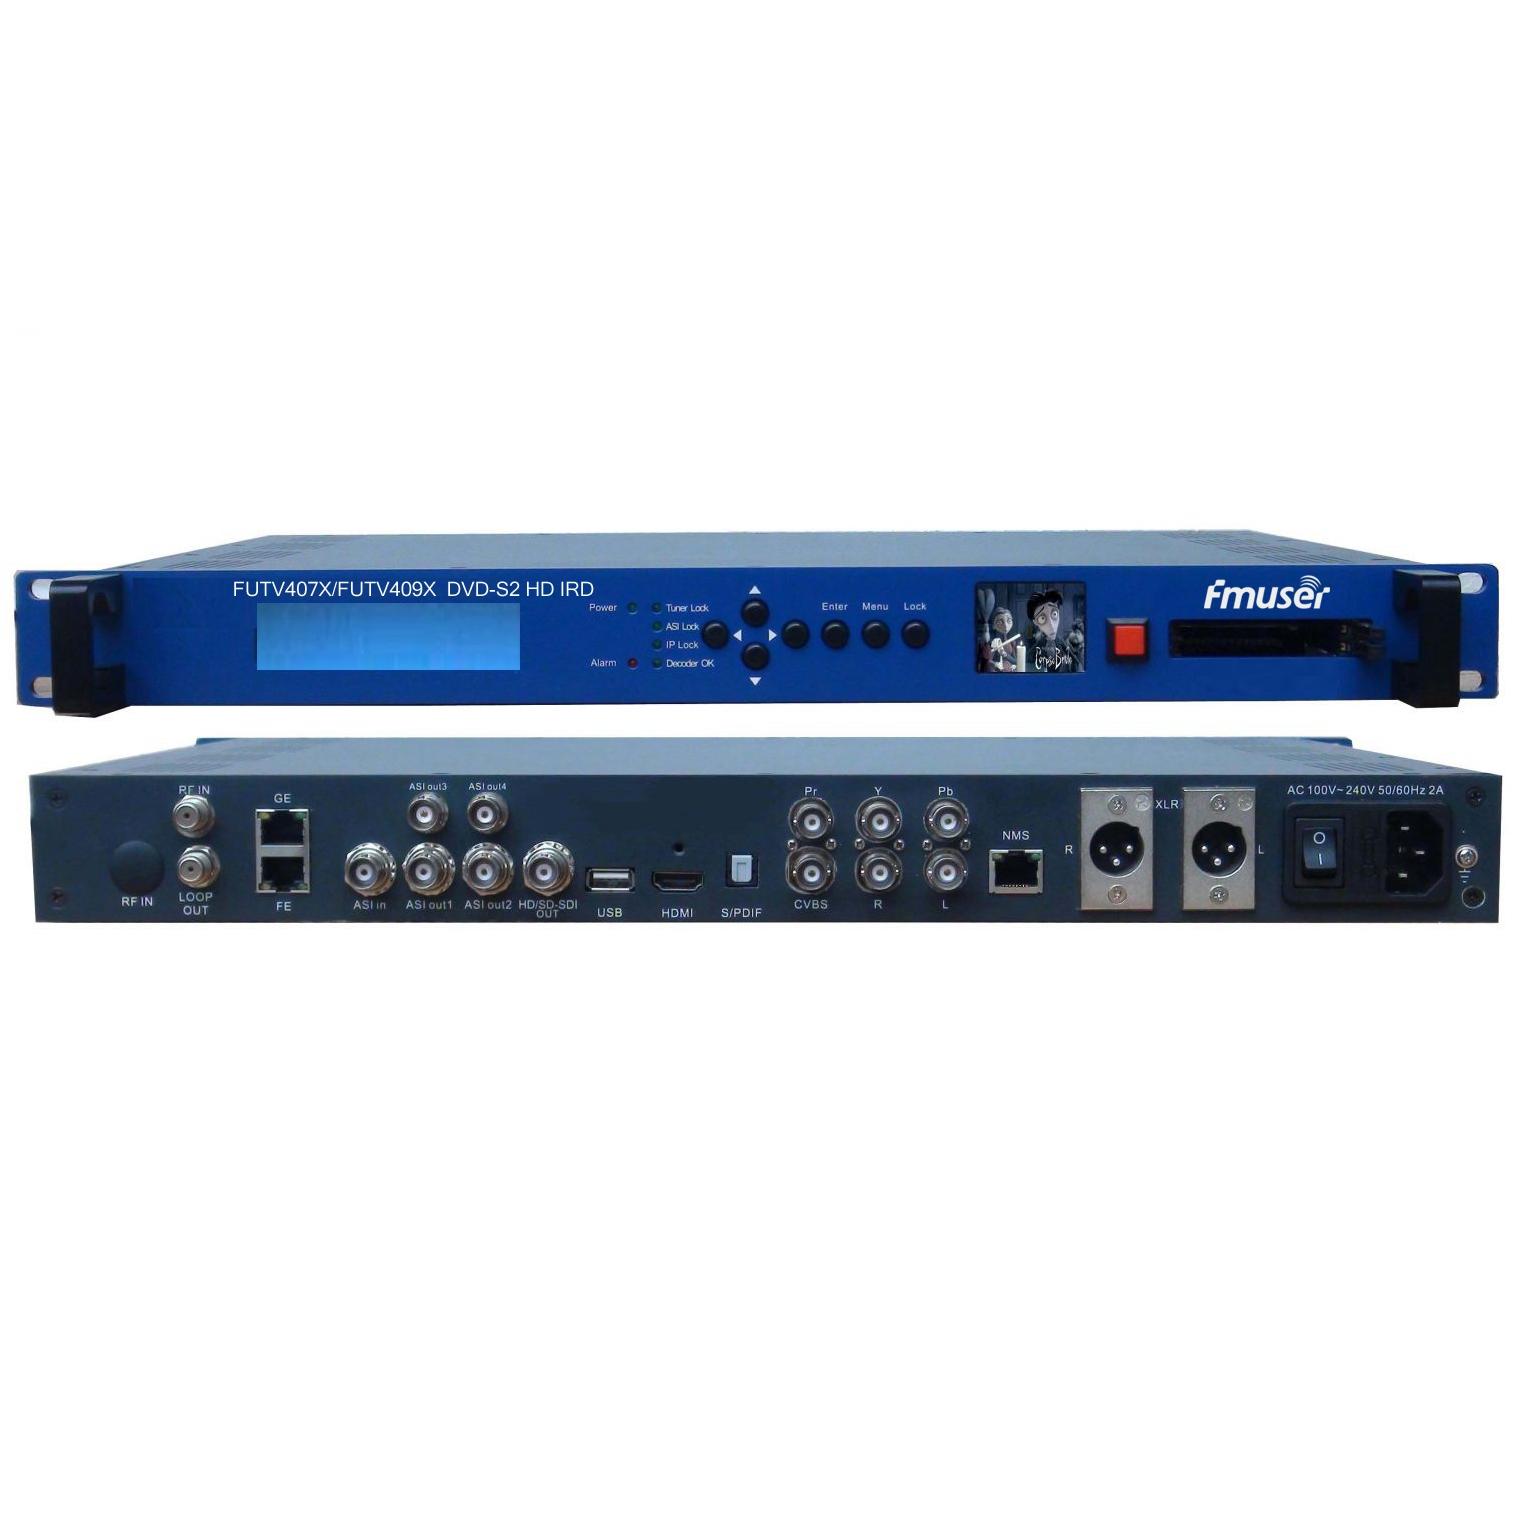 FMUSER FUTV409X / FUTV407X CAM IRD (1 DVB-C / T / S / S2, DMB-T, ISDB-T, entrada de RF ATSC-T 8VSB, entrada de 1 ASI IP, entrada de 2 ASI 1 IP, saída de HDMIUMI ASI XNUMX, saída HDMI SDI CVBS XLR) com tela ao vivo